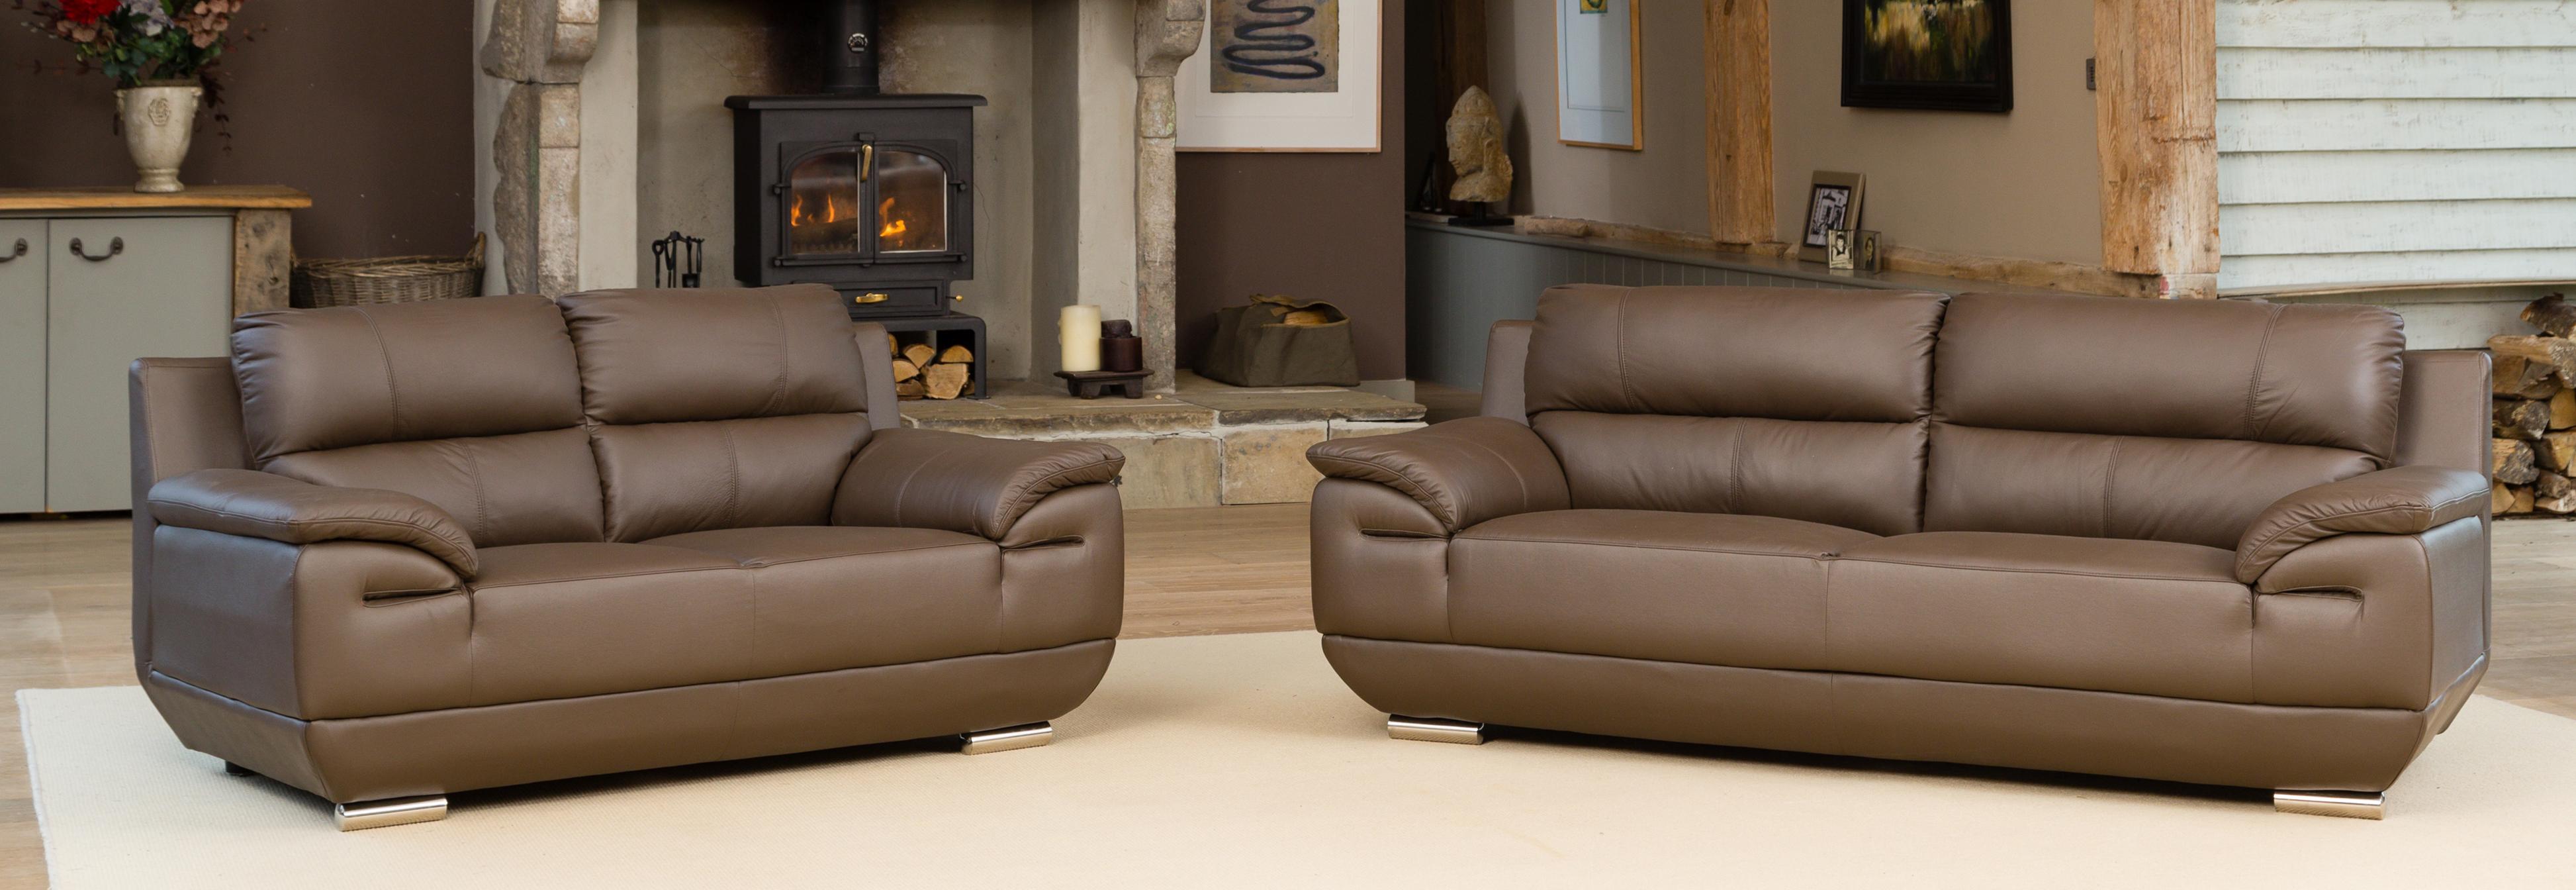 The Sofa Company